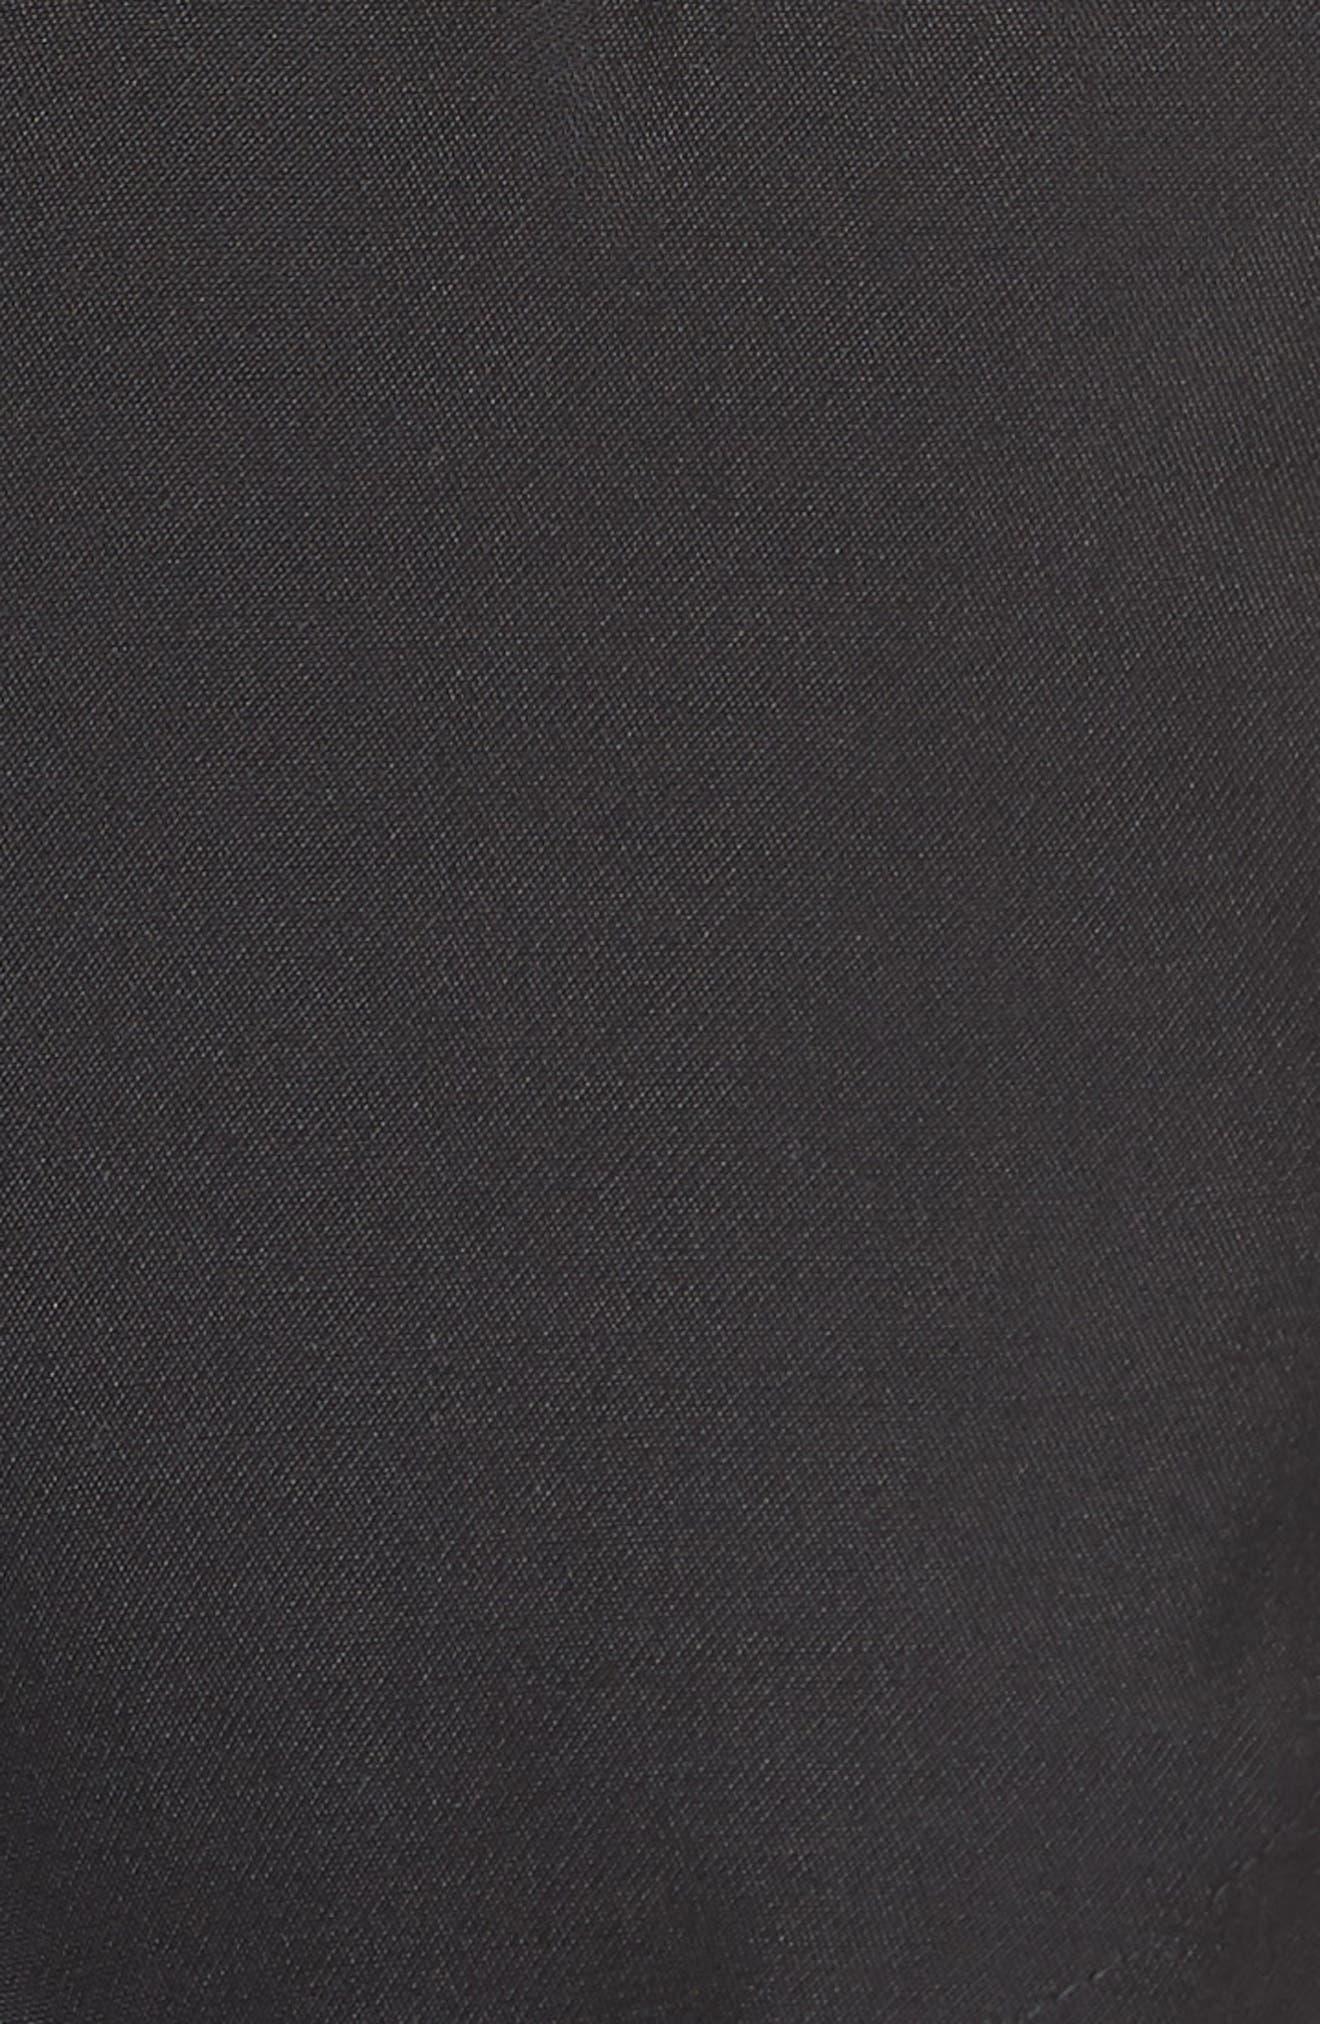 Belted Sleeveless Jacket,                             Alternate thumbnail 7, color,                             001